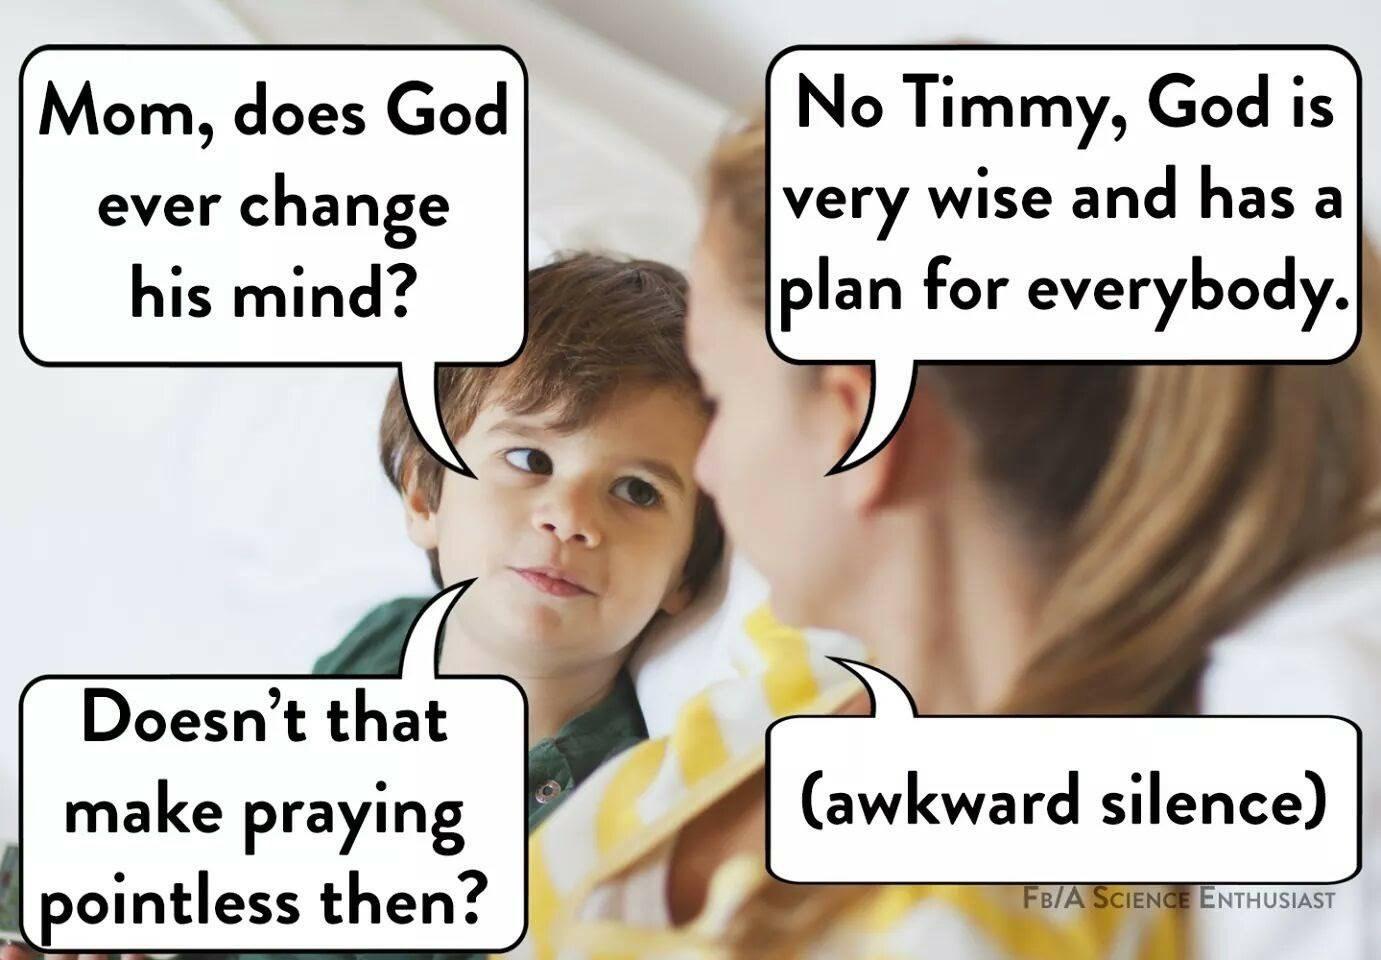 lol jk...there is no god - meme